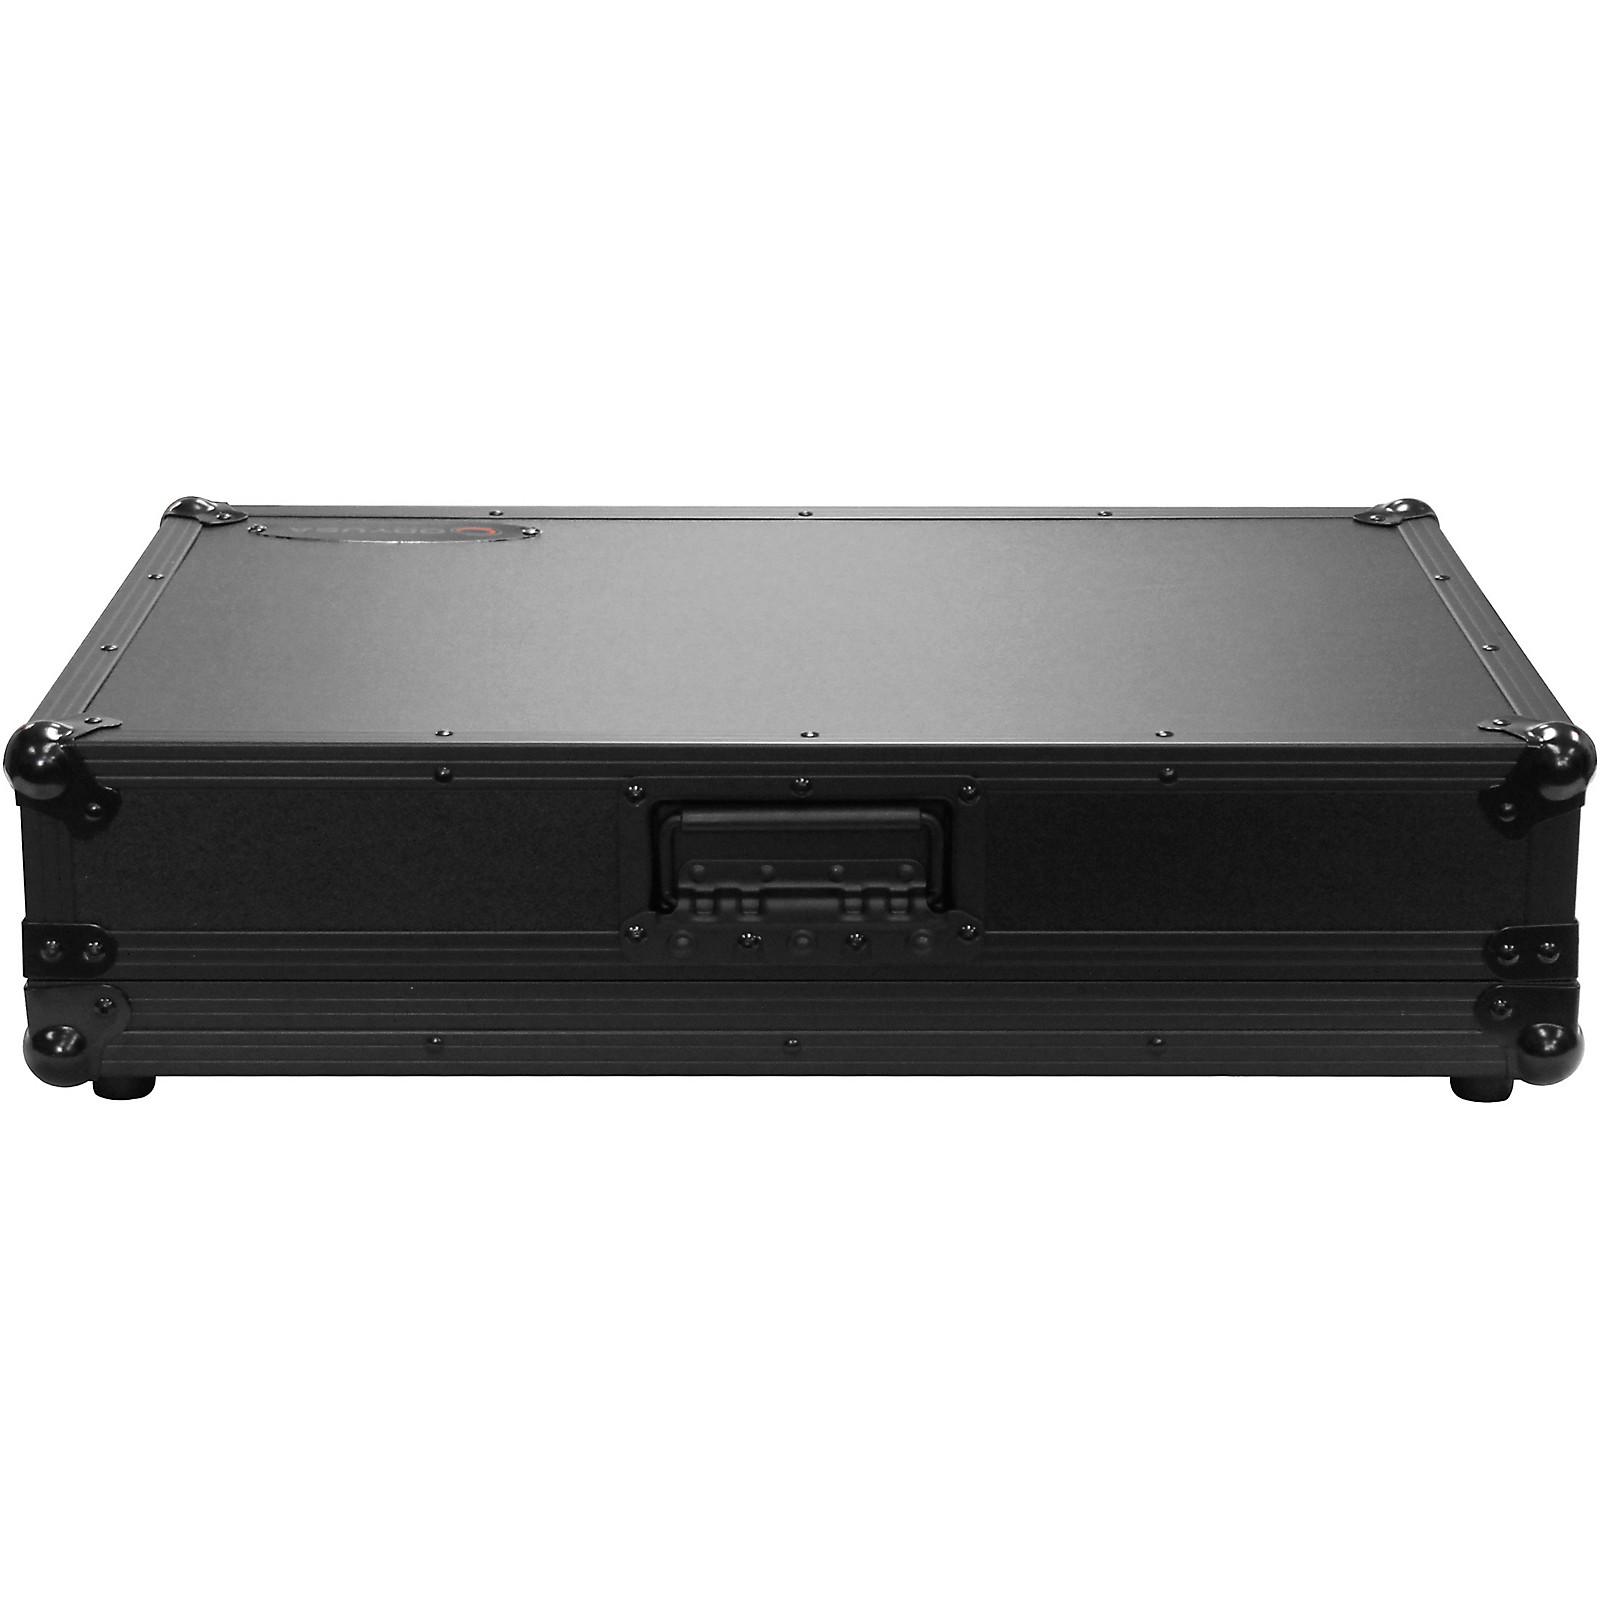 Odyssey FRGSPIDDJRRBL Black Label Low Profile Glide Style Pioneer DDJ-RR / DDJ-SR DJ Controller Case